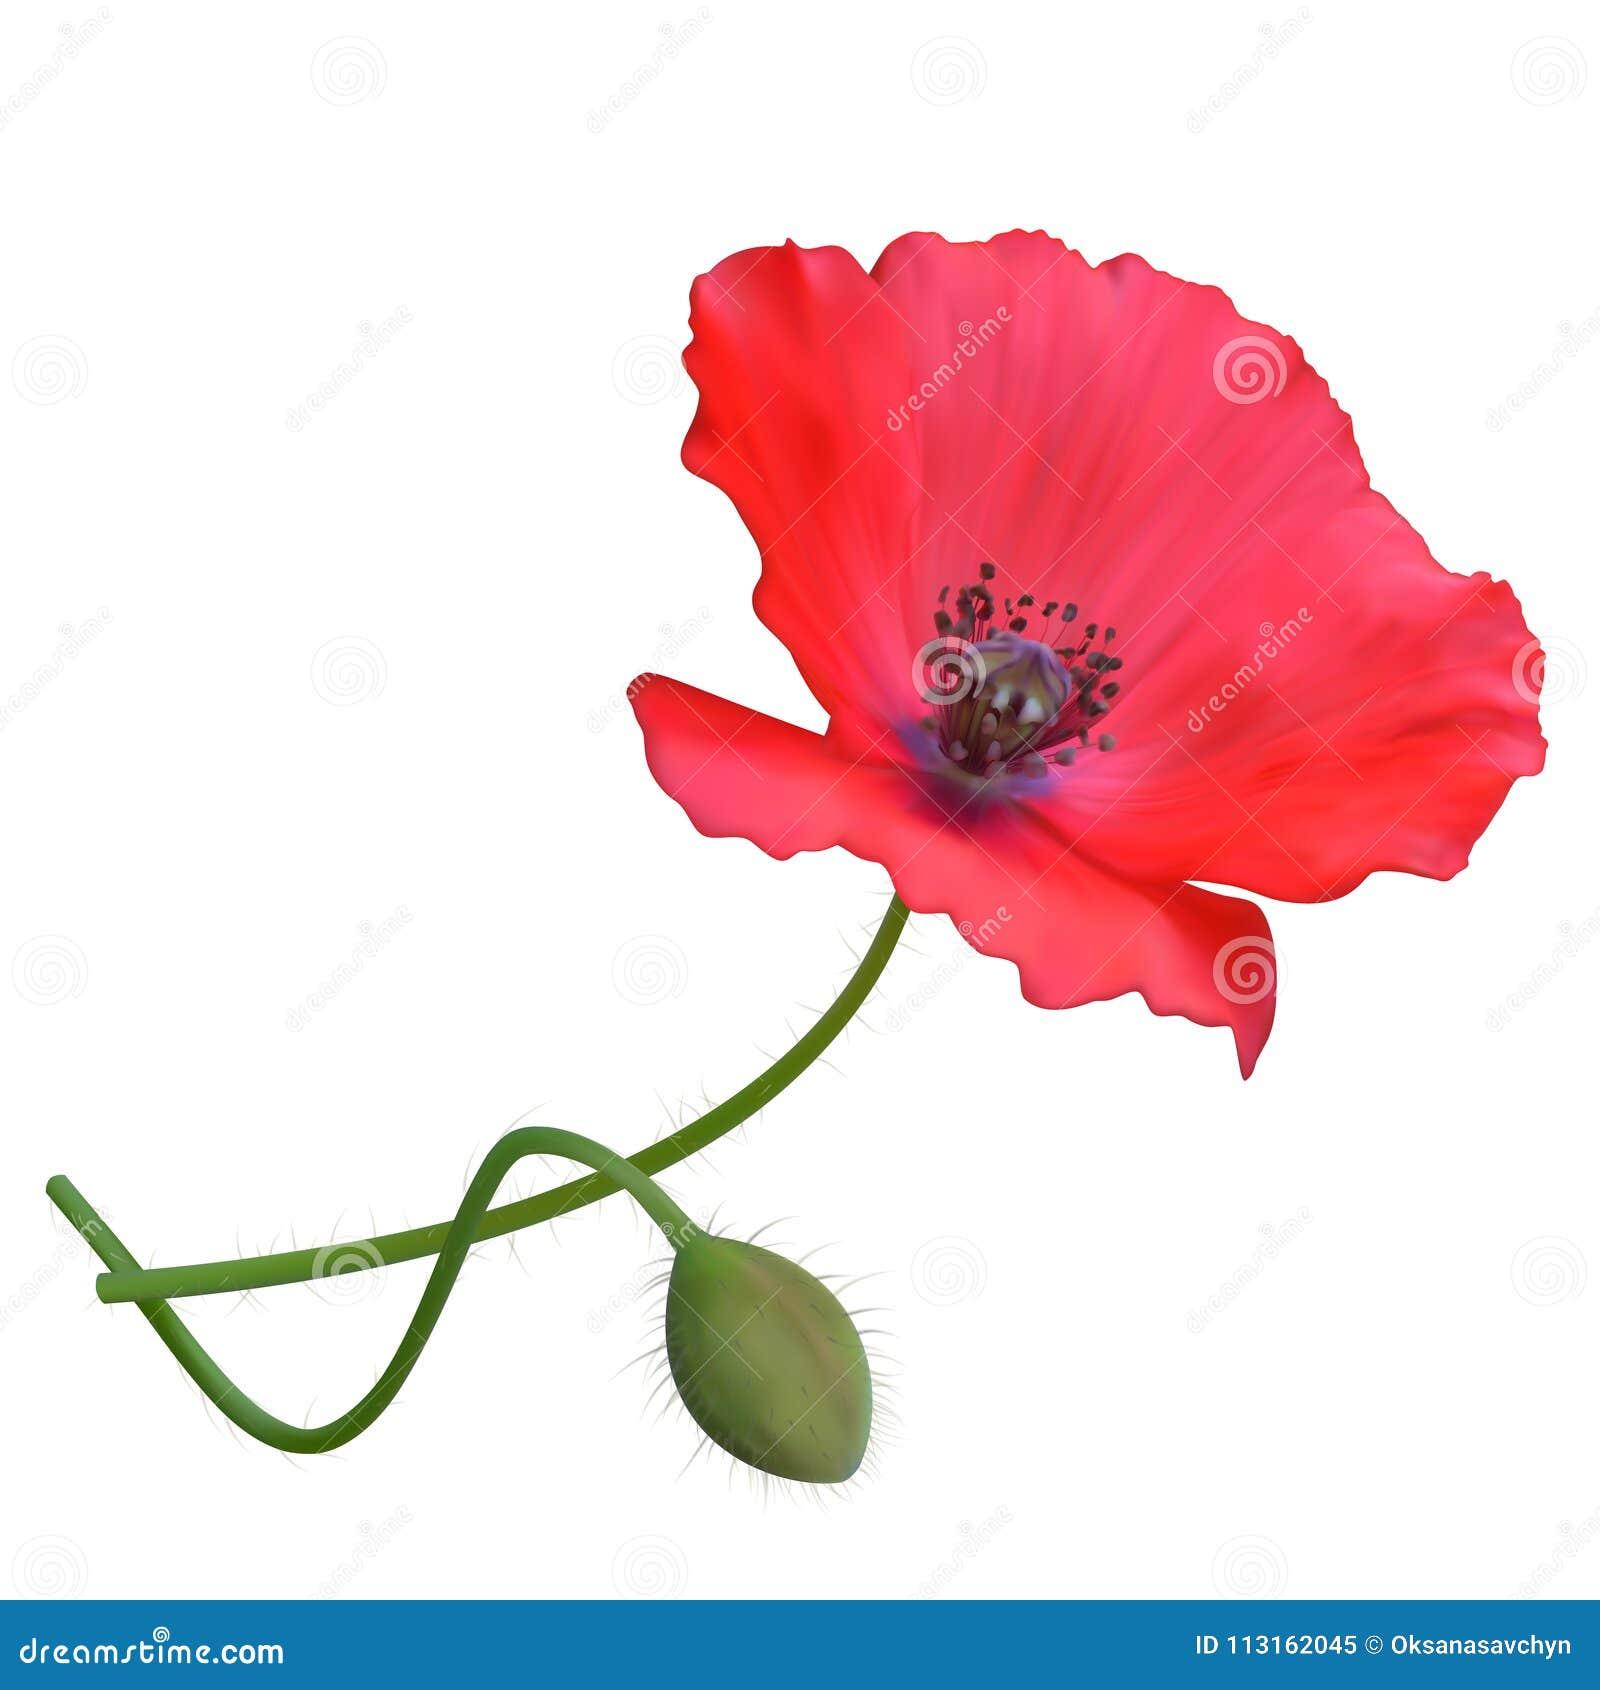 Red poppy flower white background stock vector illustration of red poppy flower white background mightylinksfo